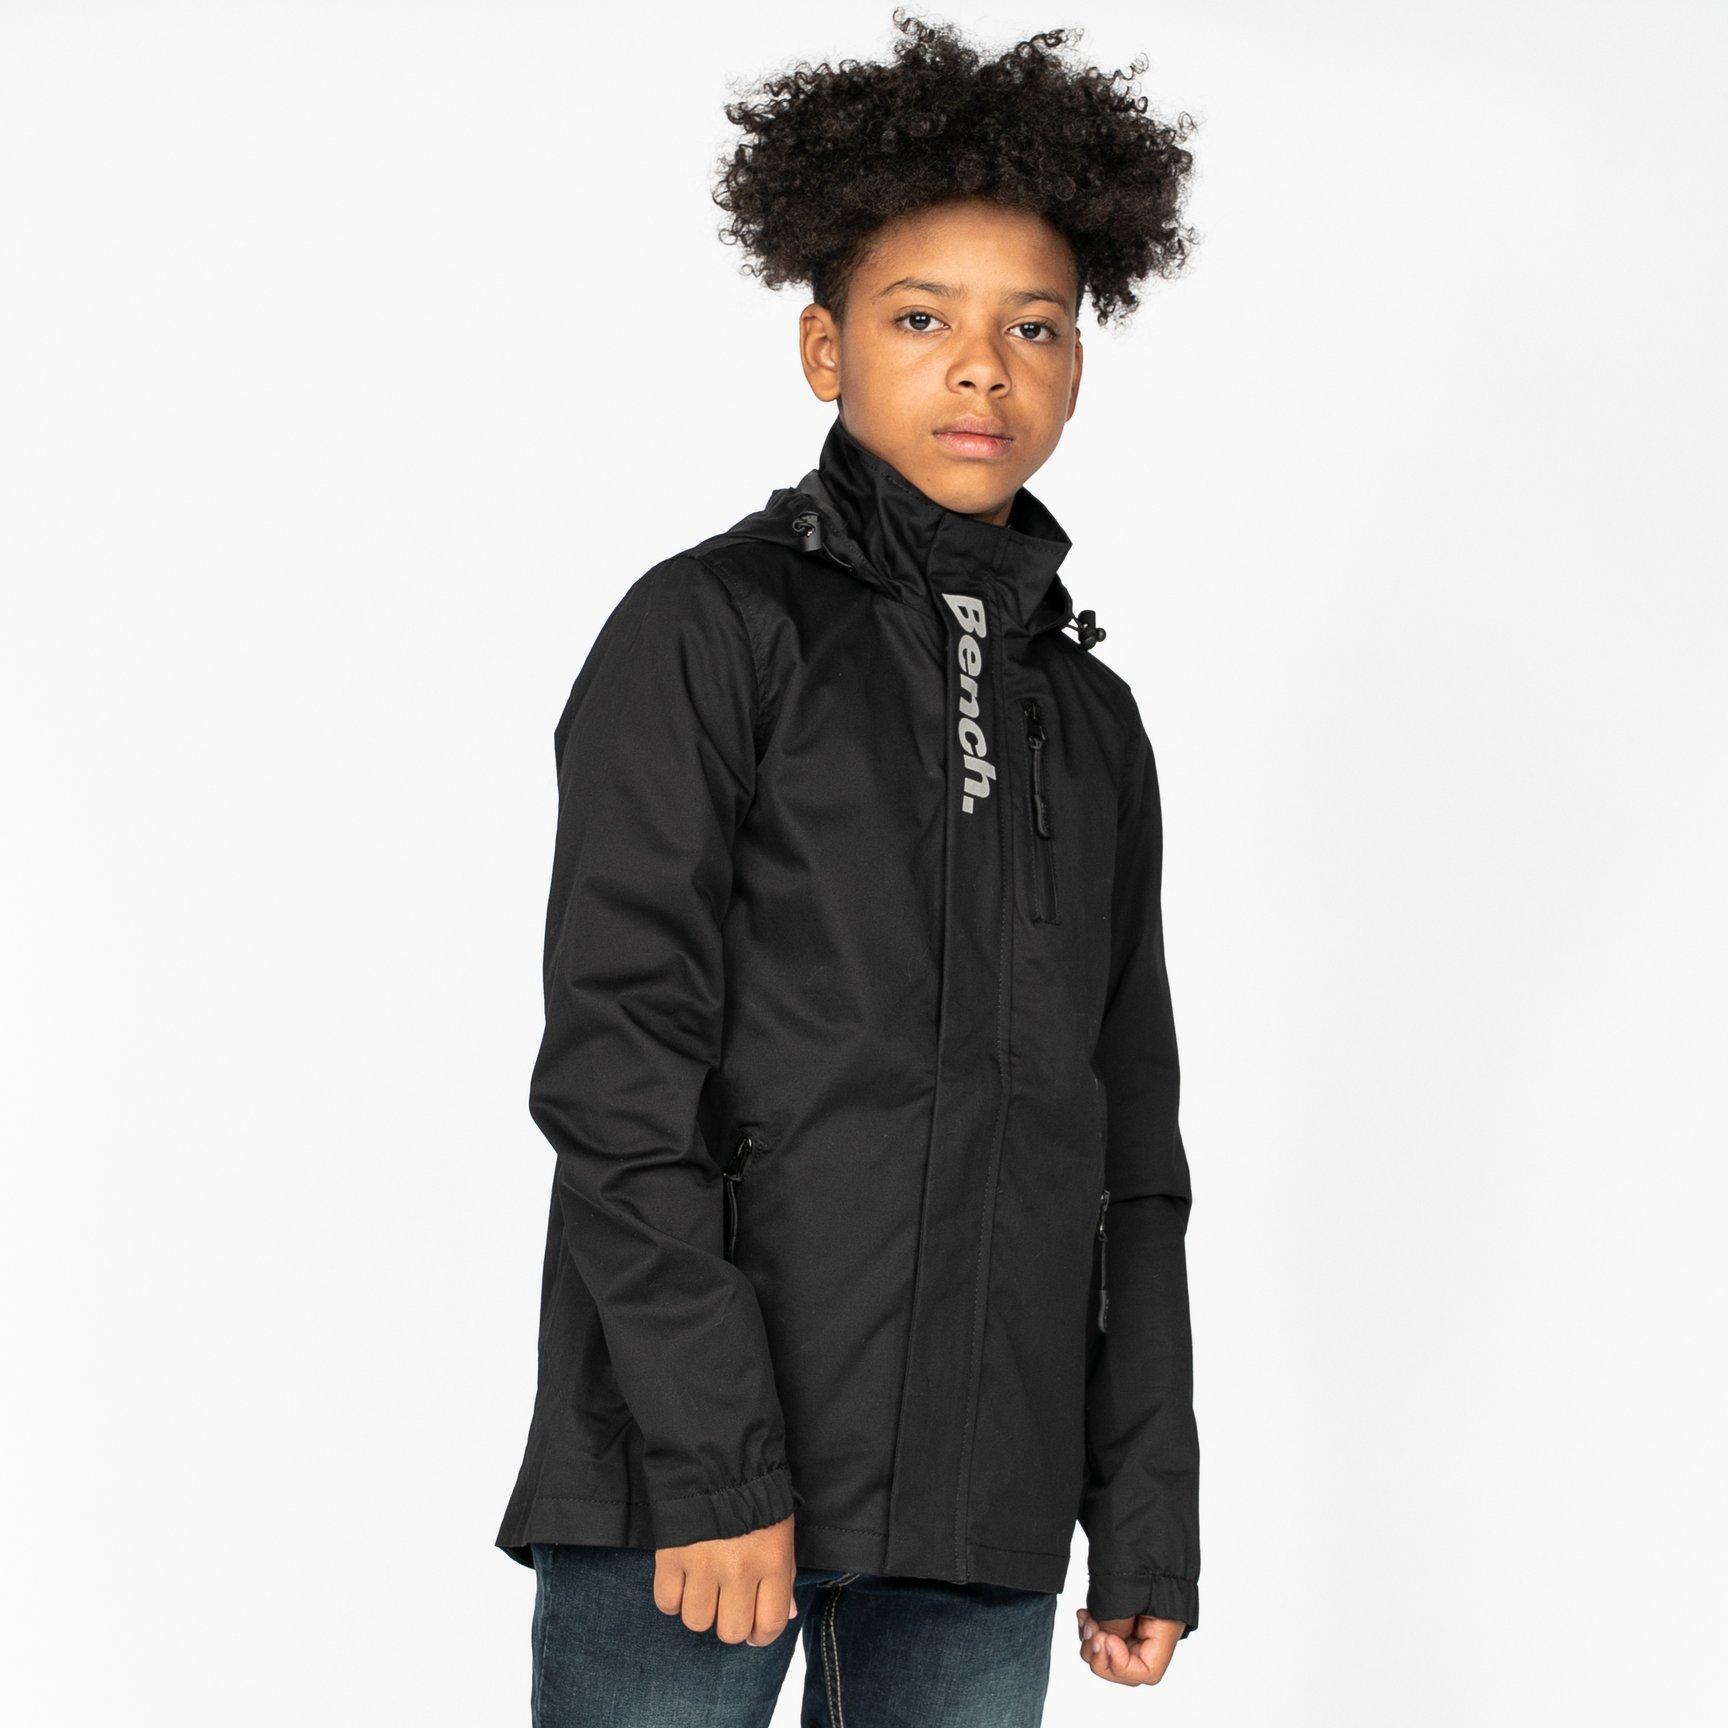 Boys winter jackets £19.99 @ Bench Shop